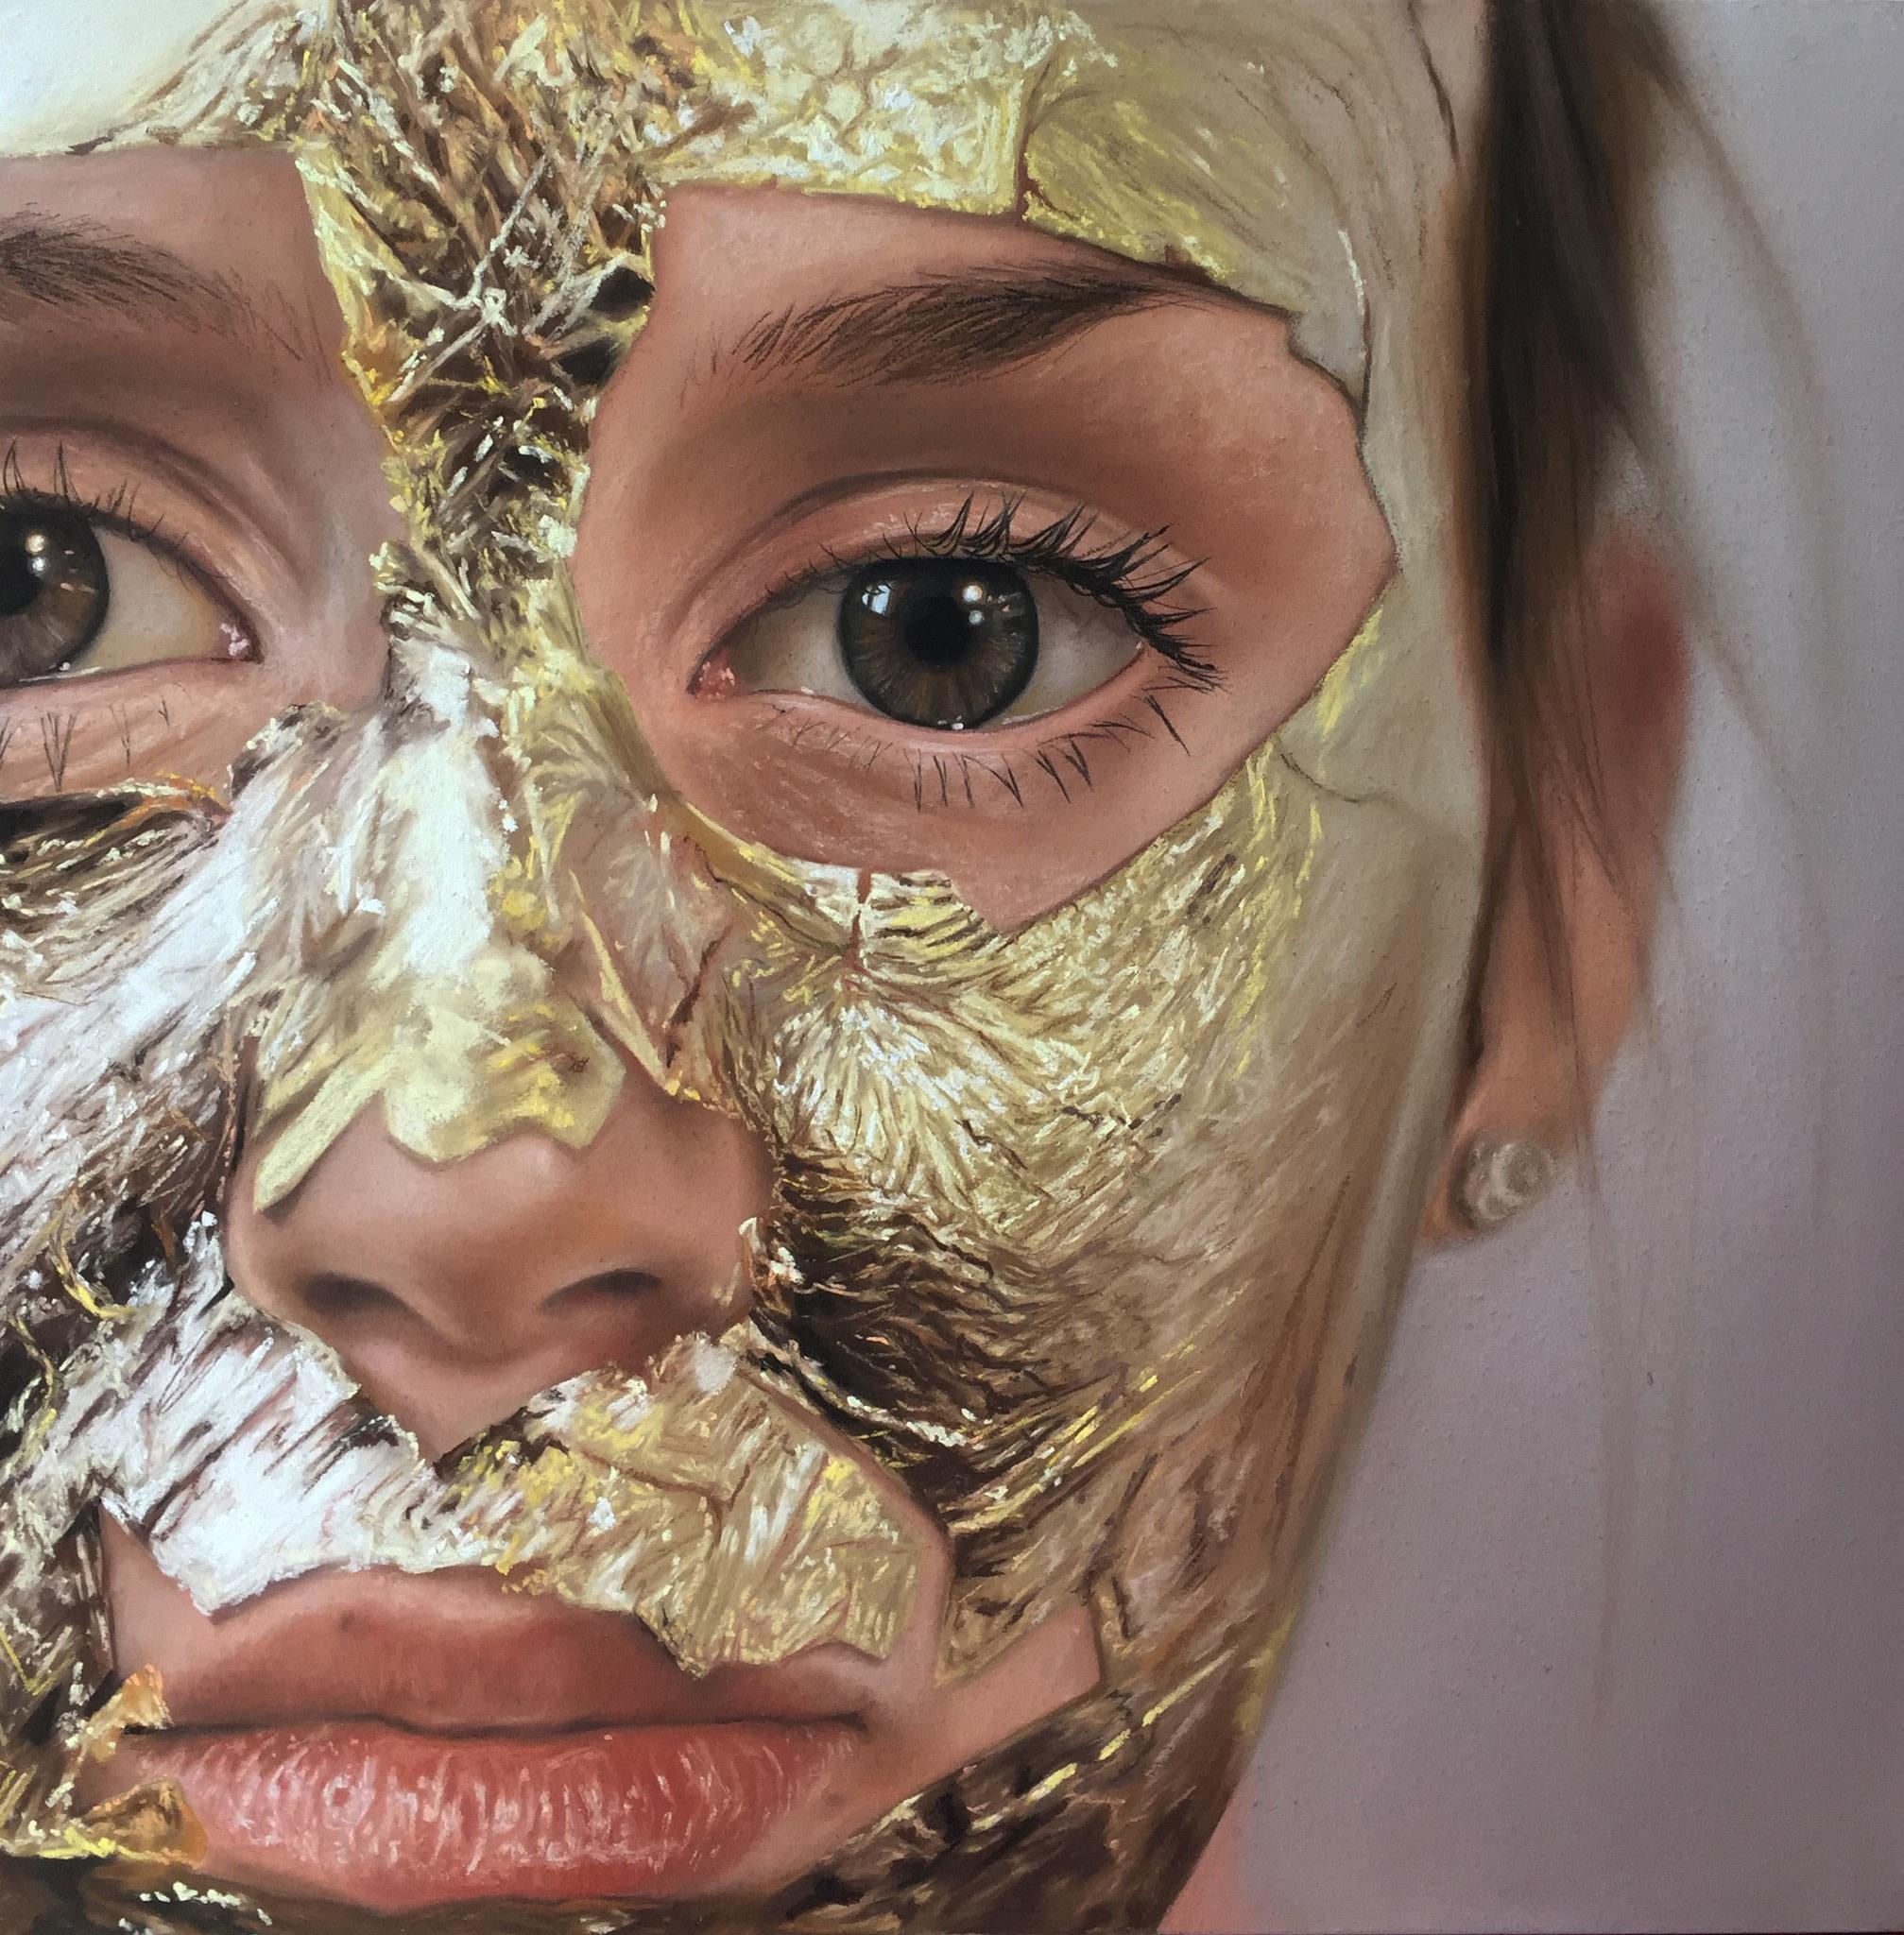 "<span class=""link fancybox-details-link""><a href=""/exhibitions/34/works/artworks1126/"">View Detail Page</a></span><div class=""artist""><strong>Oliver Jones</strong></div><div class=""title""><em>Gold Leaf Face Mask</em>, 2016</div><div class=""medium"">Pastel on Paper</div><div class=""dimensions"">47 x 47 cm<br>18 1/2 x 18 1/2 in.</div>"